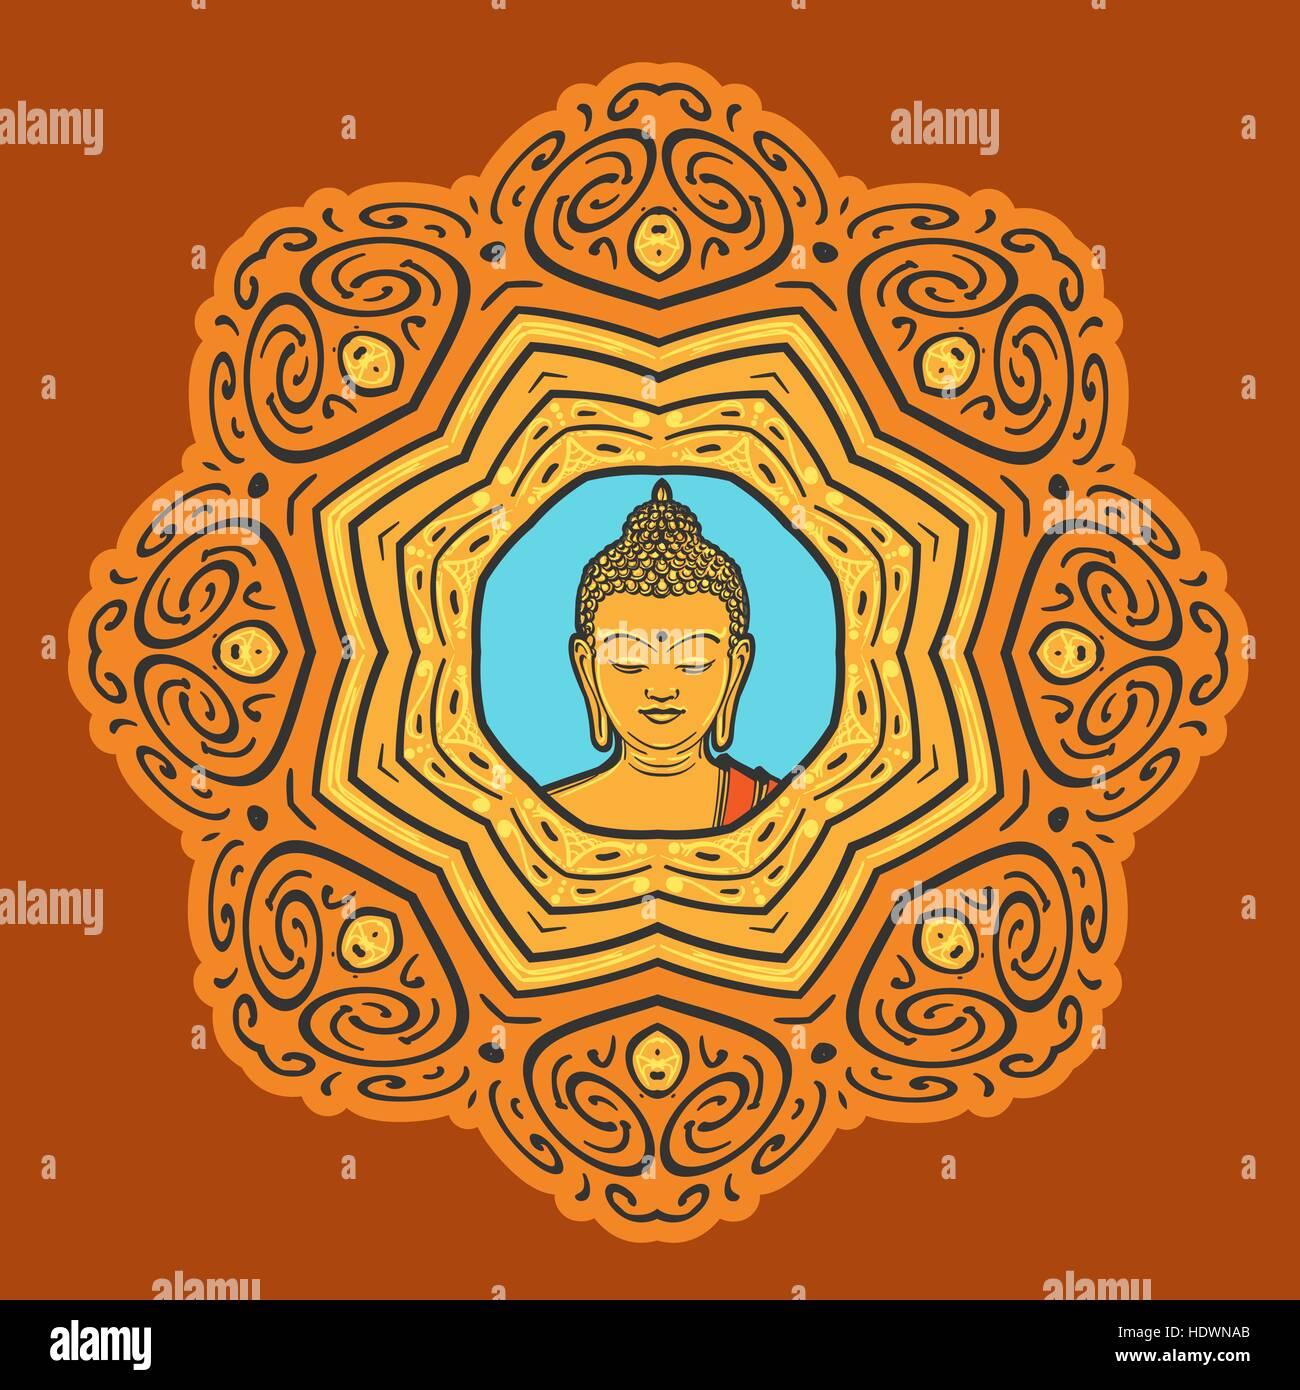 c3708951e4c66 Buddha face over ornate mandala. Esoteric vintage vector illustration.  Indian, Buddhism, Thai